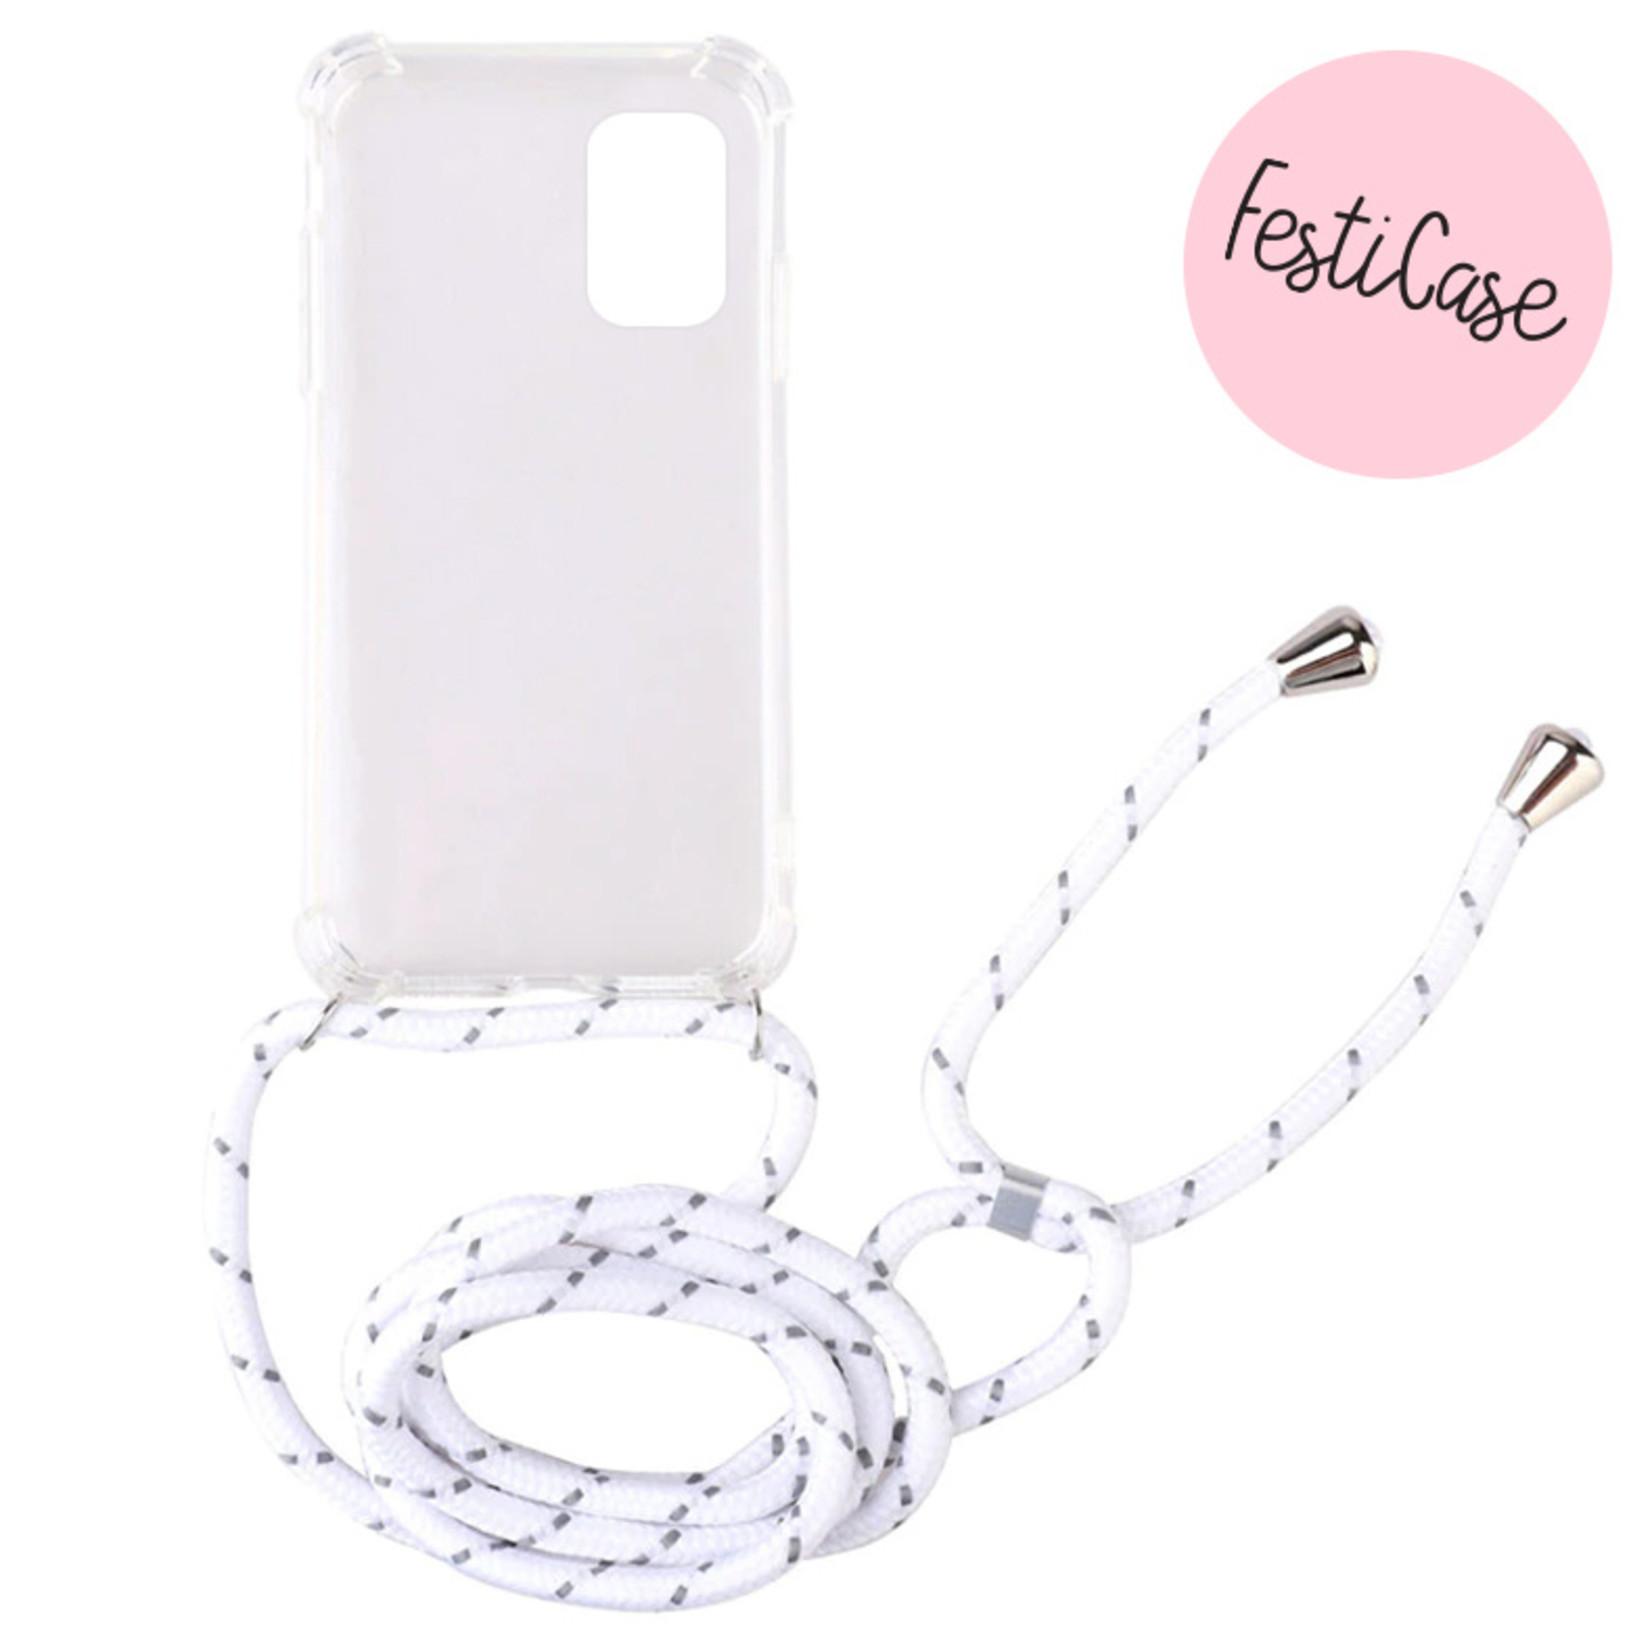 FOONCASE FESTICASE Samsung Galaxy A51 Telefoonhoesje met koord (Wit) TPU Soft Case - Transparant